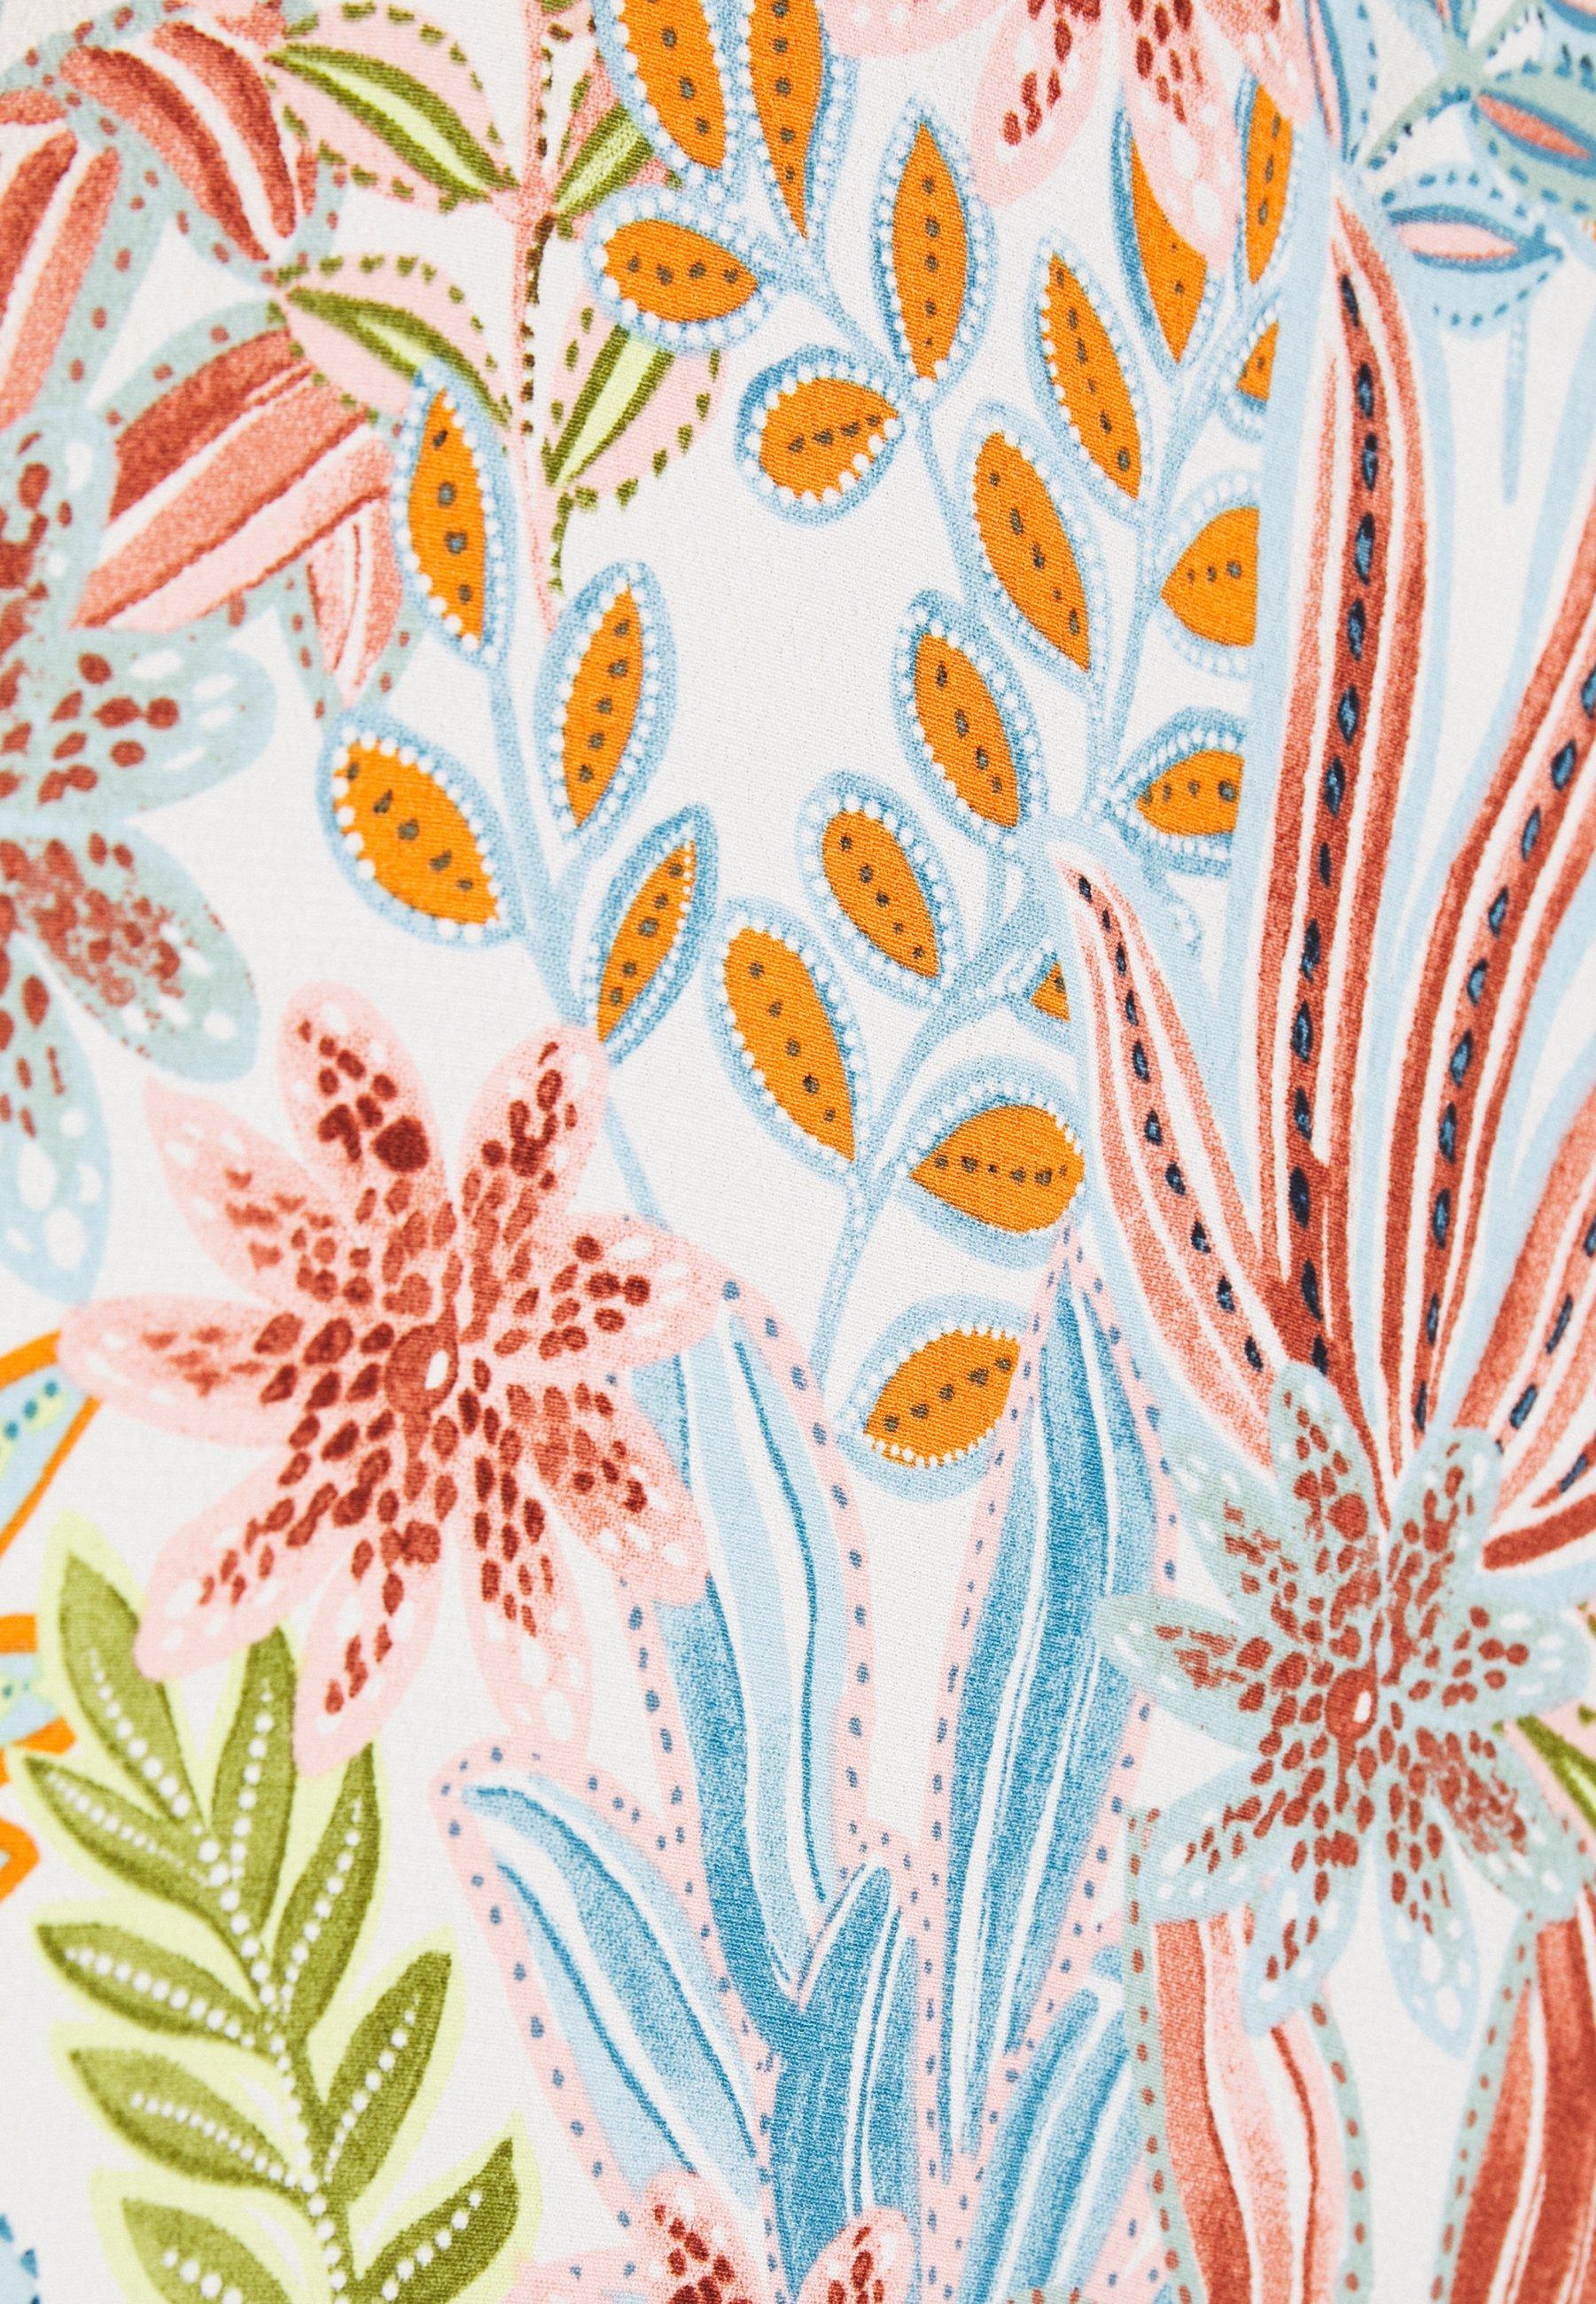 Yas Yasbotanica Long Skirt - A-lijn Rok Eggnog/botanica